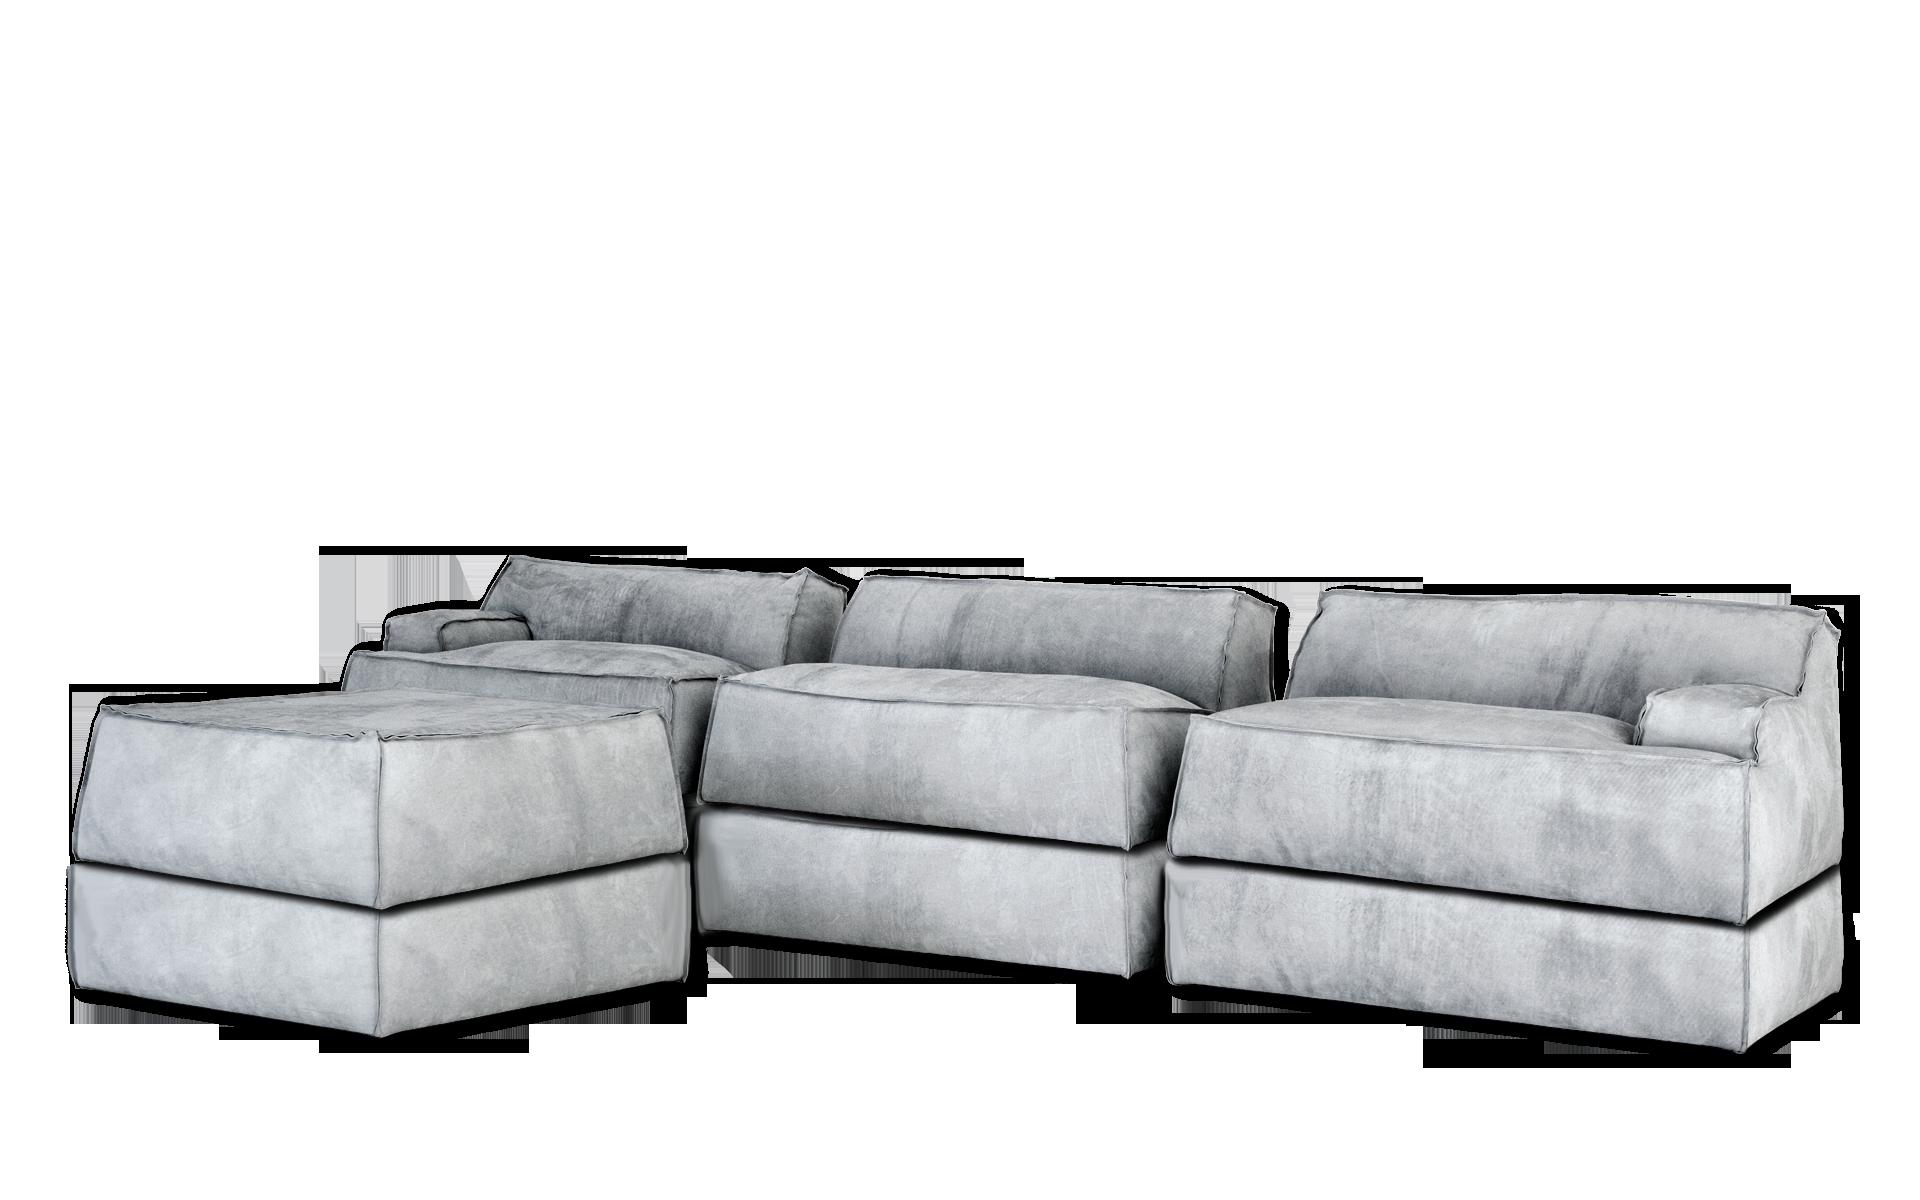 damasco - baxter | ⓢⓔⓐⓣⓘⓝⓖ | pinterest | grigio e divani - Angolo Chaise Whistler Grigio